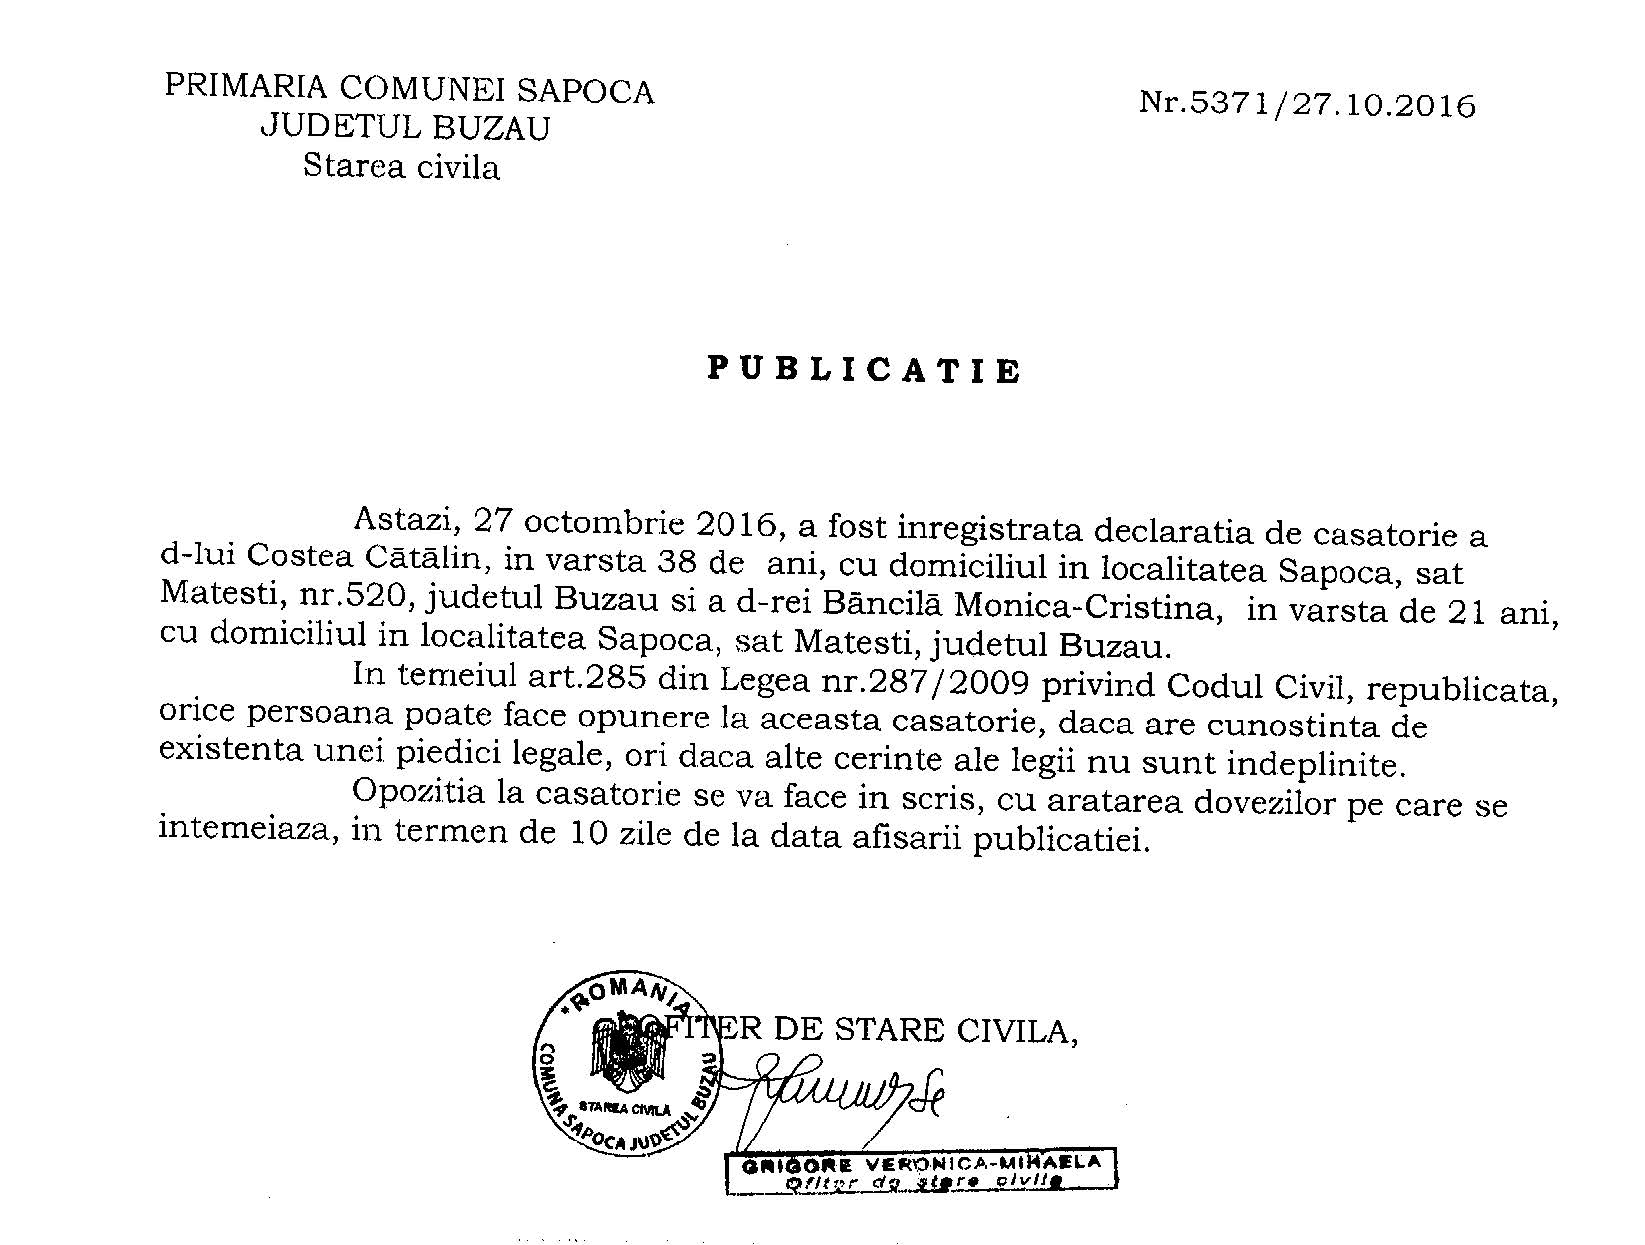 publicatie-casatorie-costa-catalin-si-bancila-monica-cristina